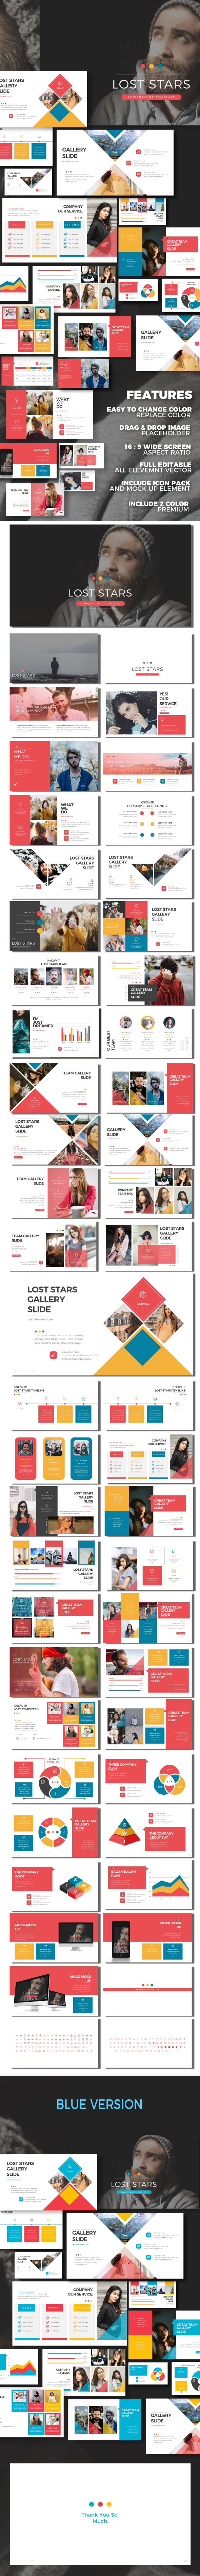 Lost Stars - Google Slide Presentation Templates - Google Slides Presentation Templates